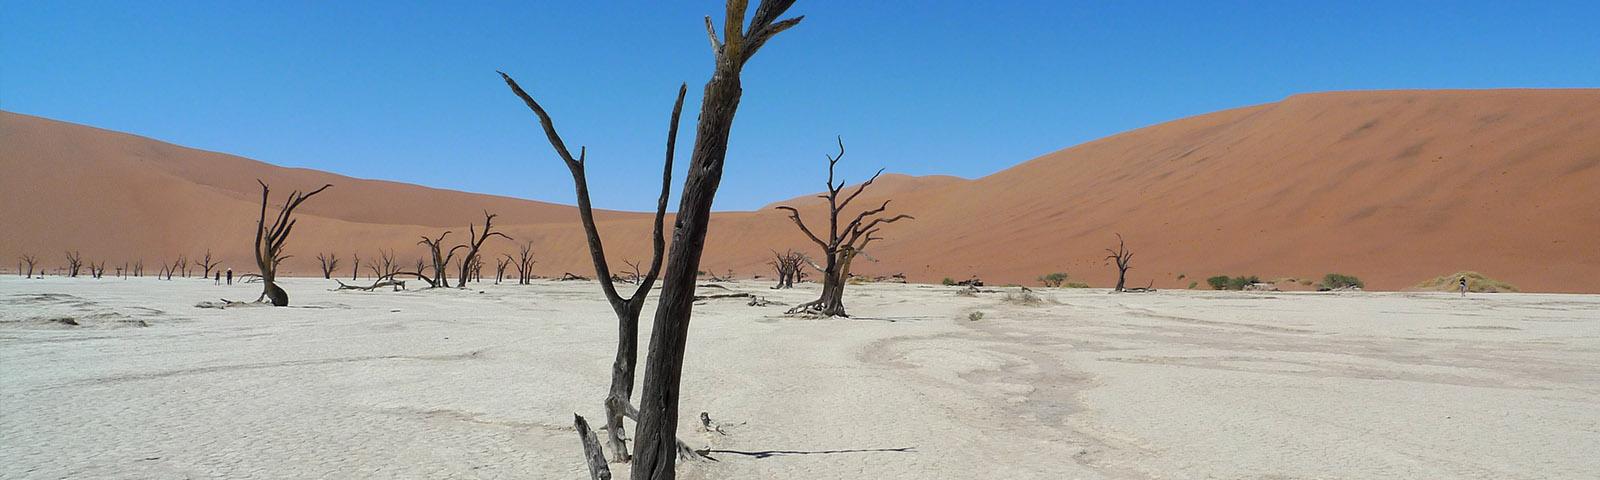 namibia-dead-vlei